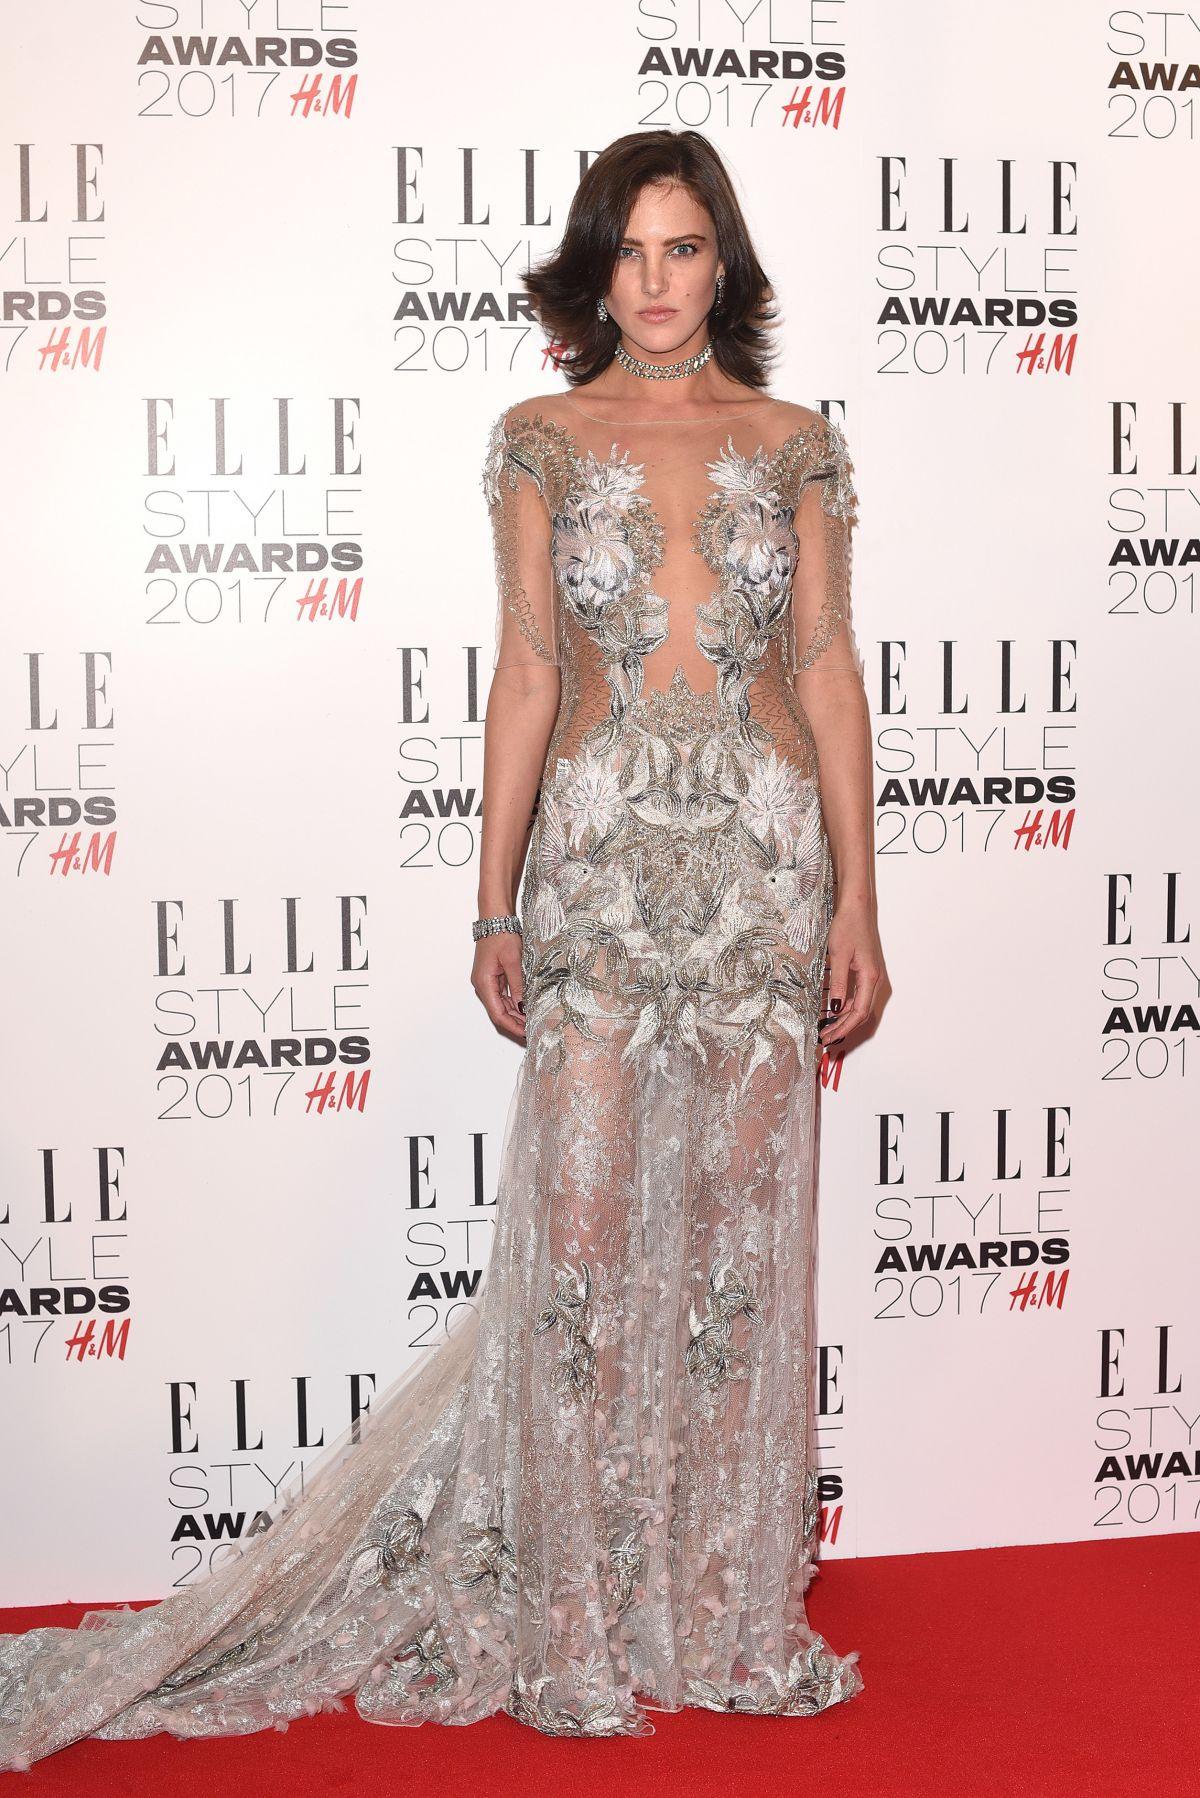 ELIZA CUMMINGS at Elle Style Awards 2017 in London 02/13/2017